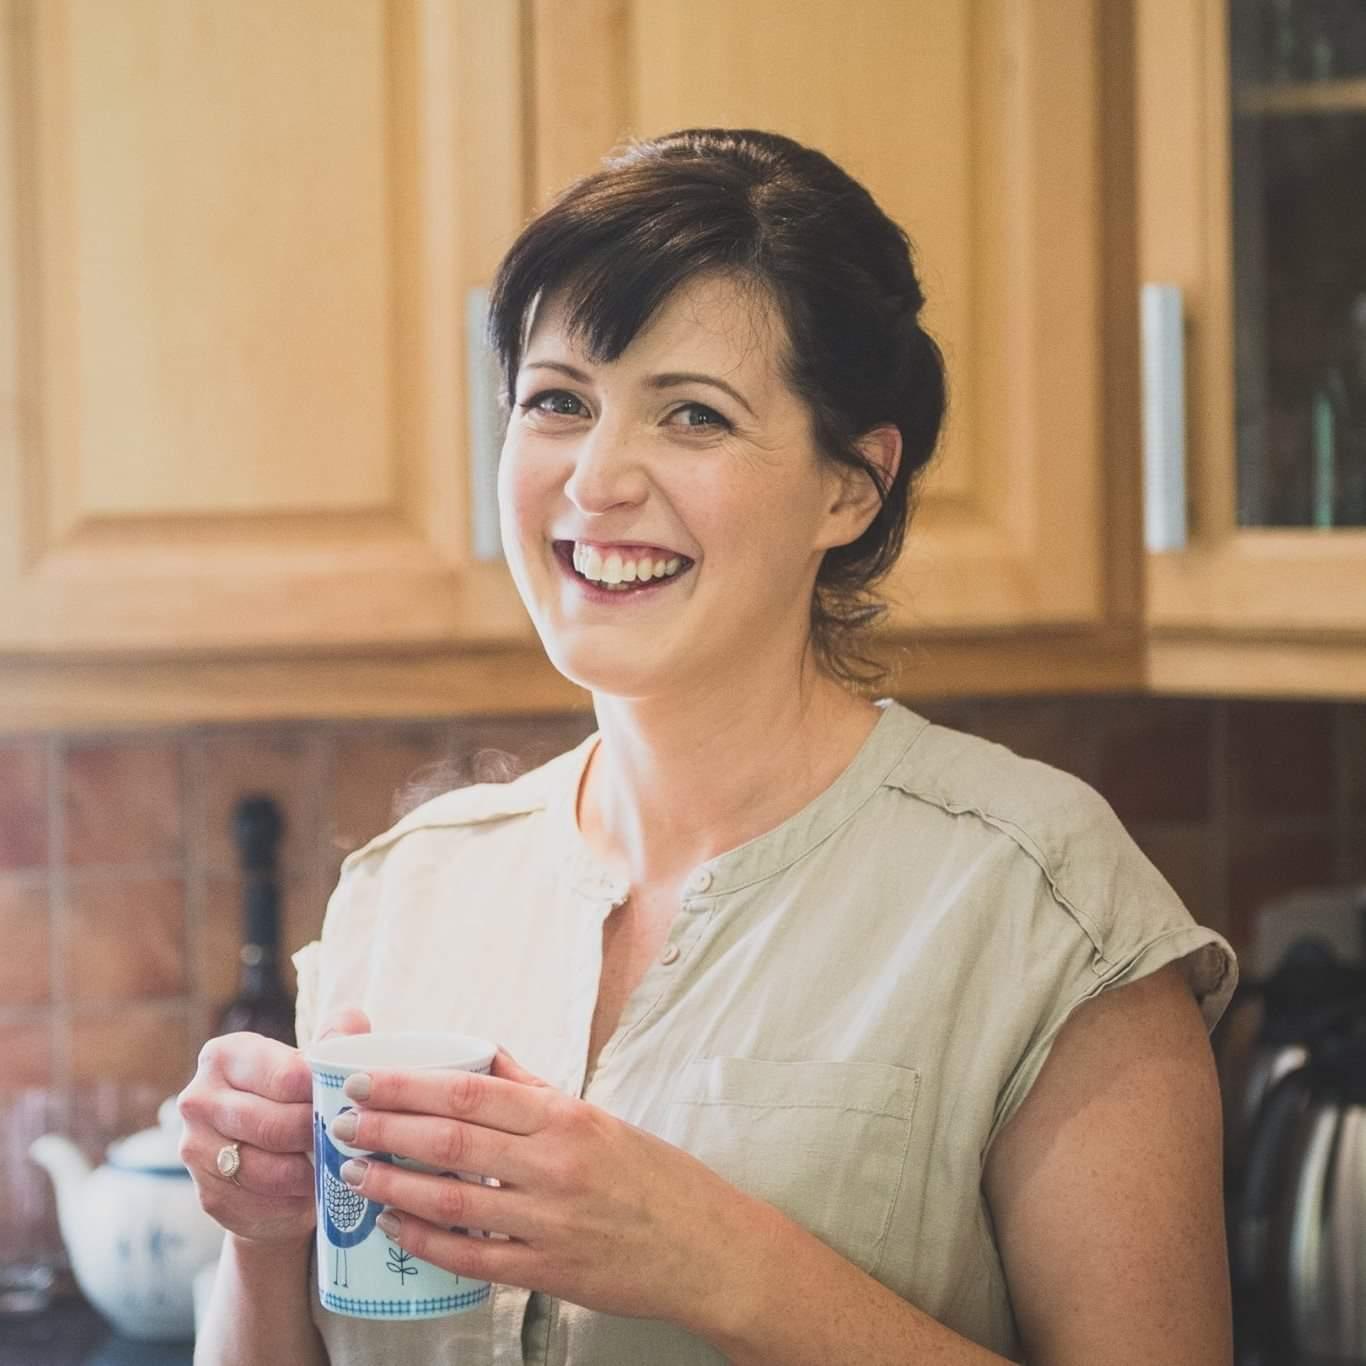 Women Of The Irish Food Industry – Róisín Matthews, Educator